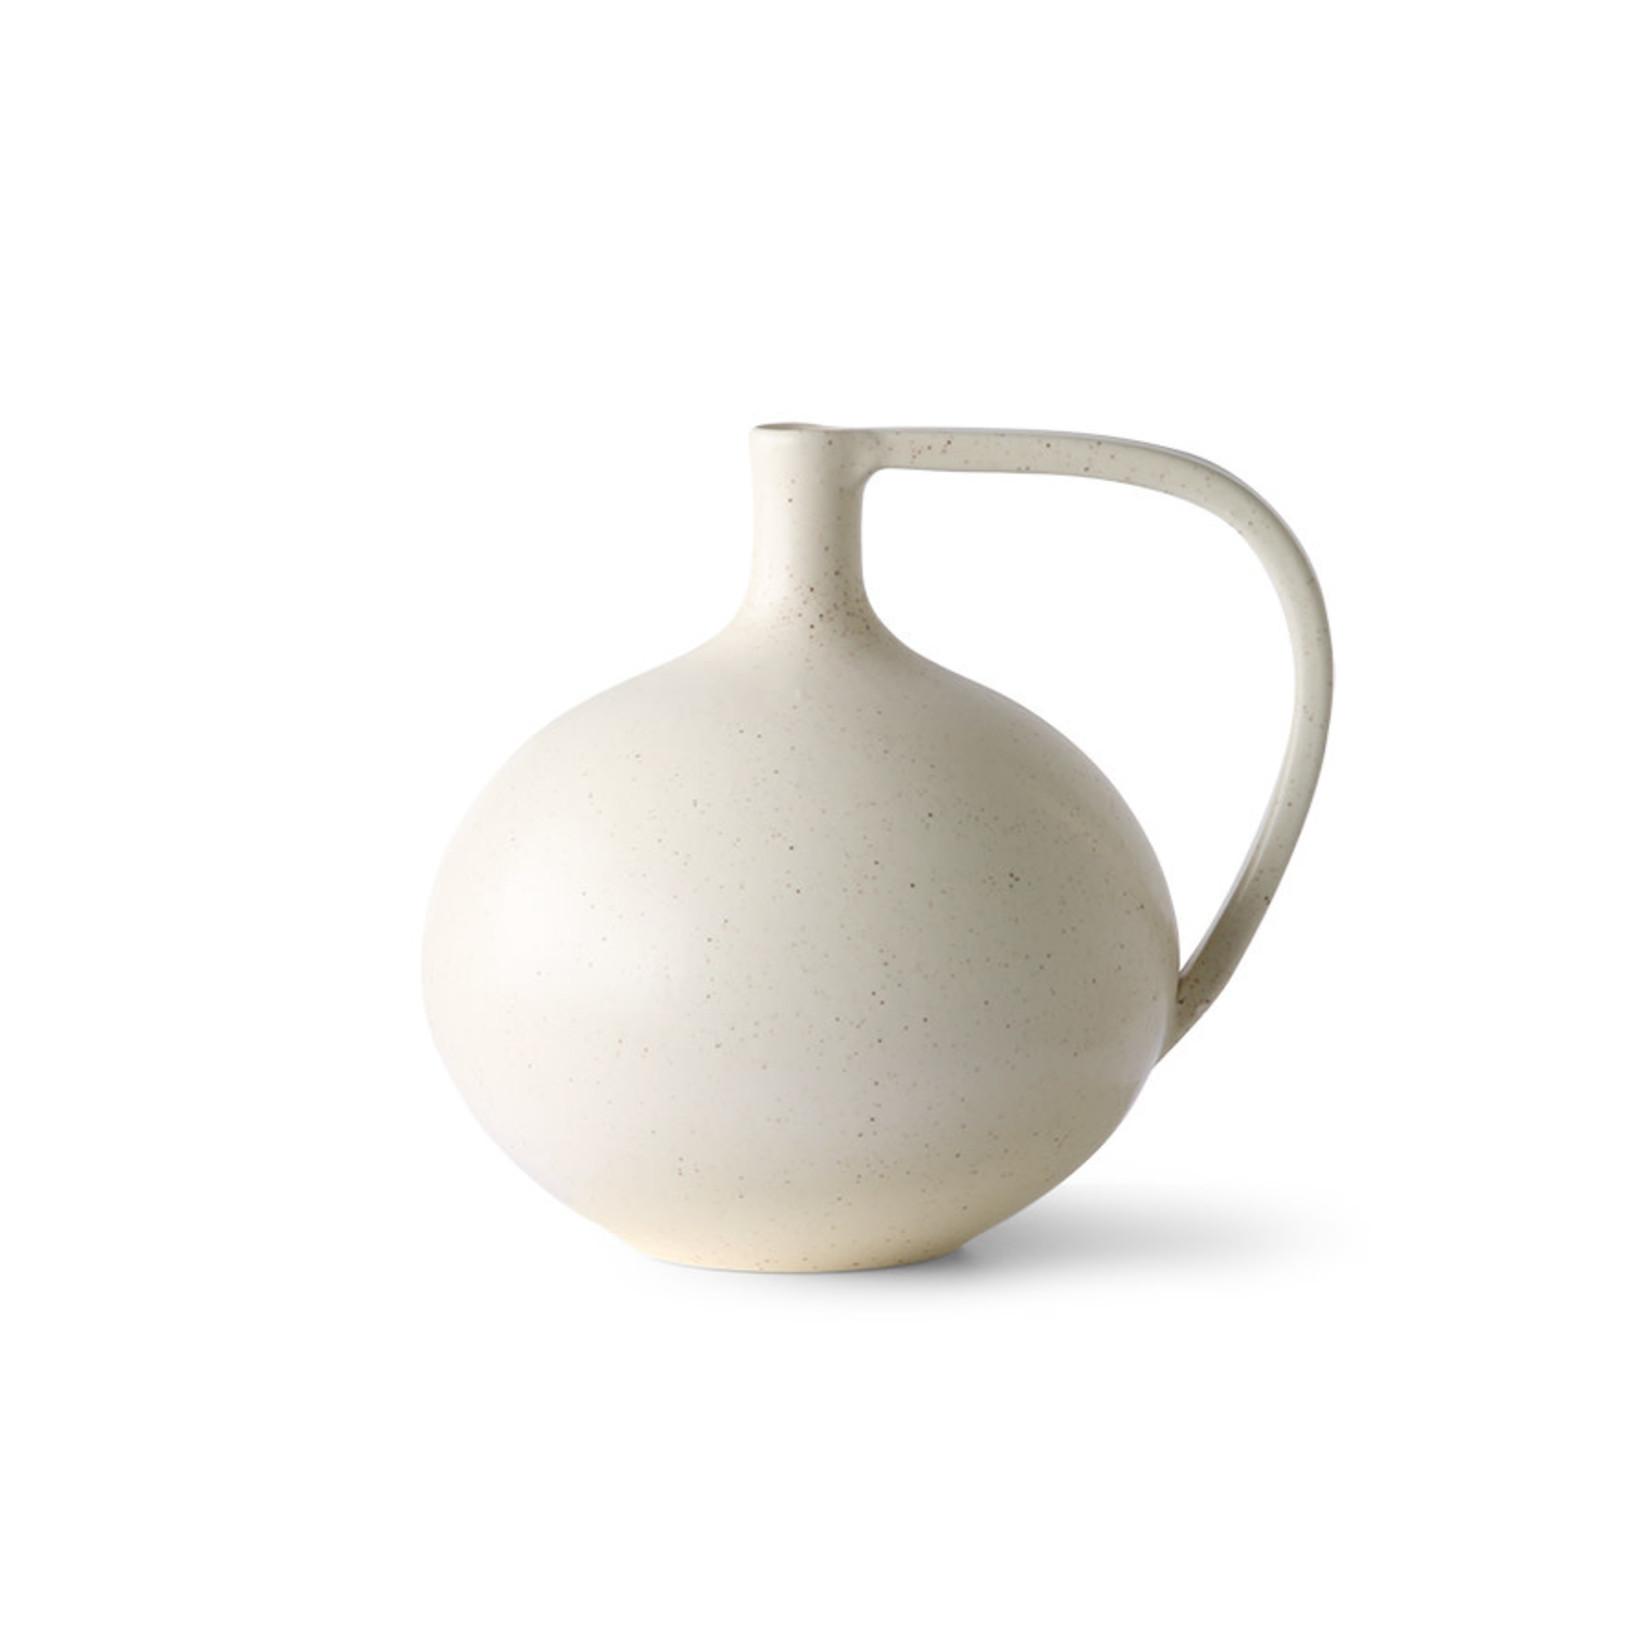 HK Living Hk living Ceramic Jar M White Speckled